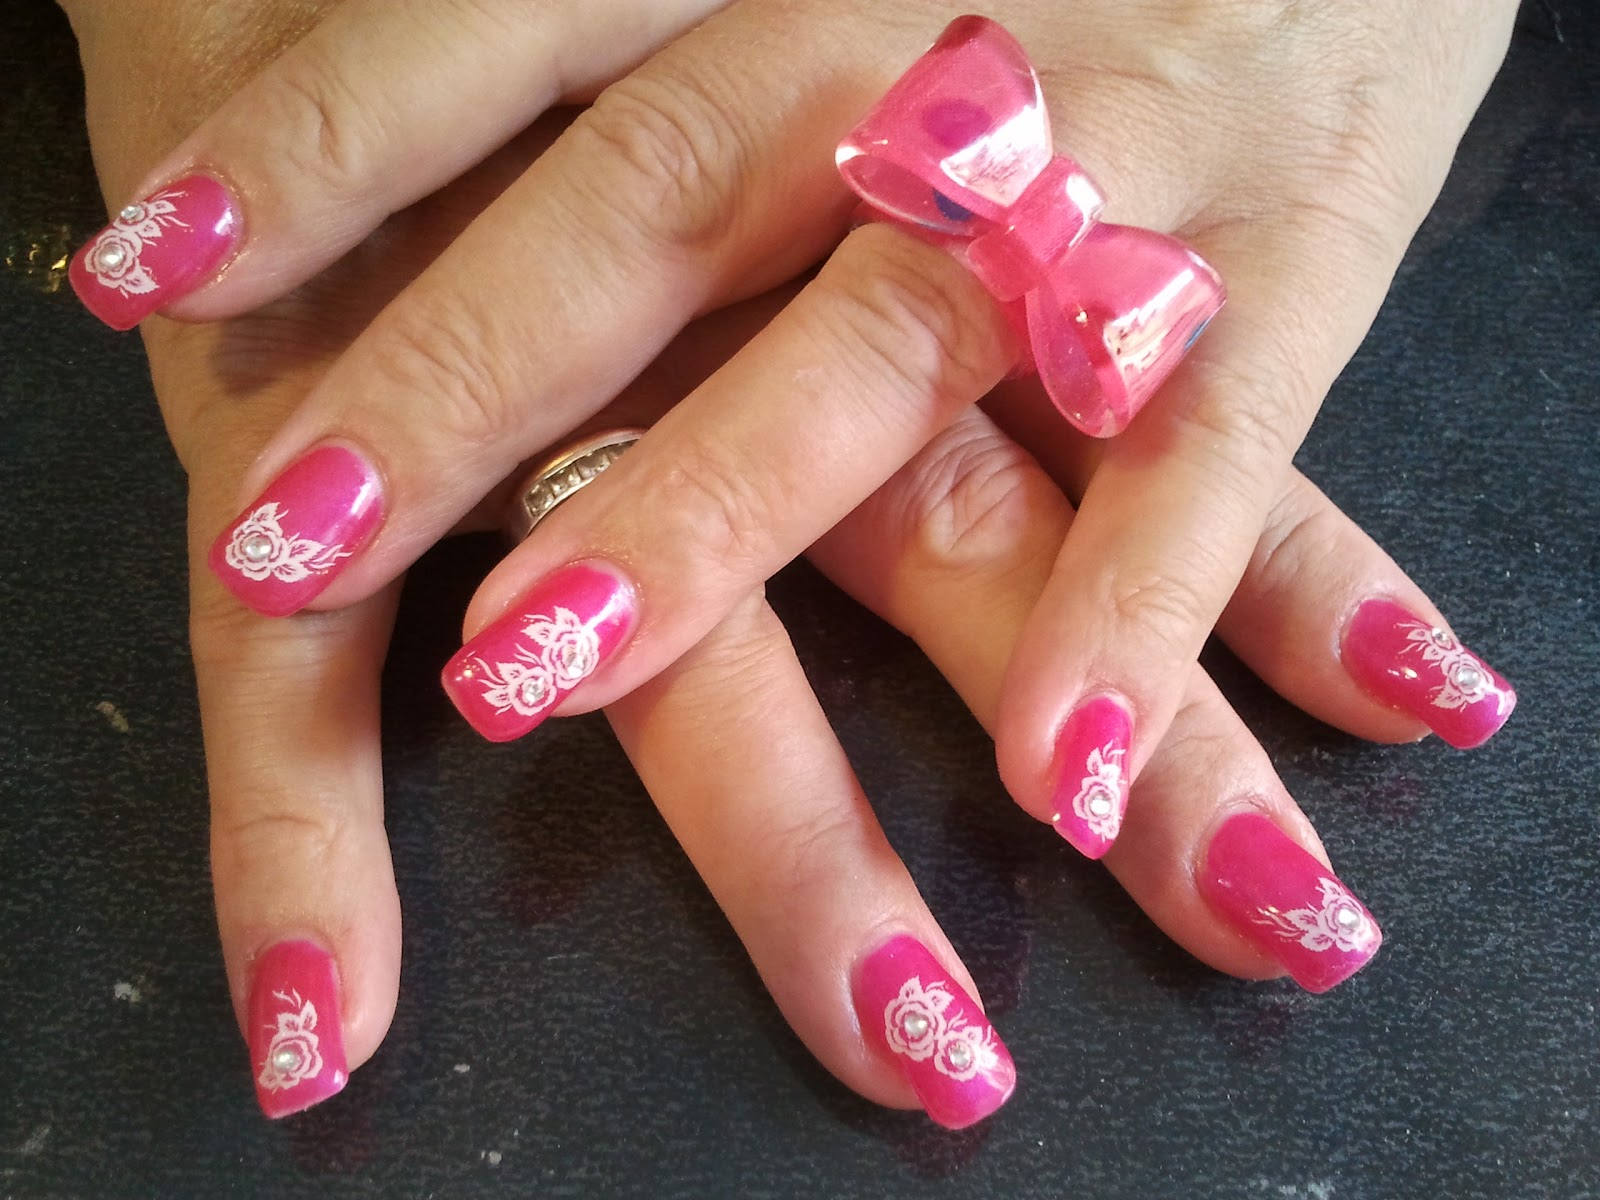 beautedesign shop stickers ongles gel de couleurs rose. Black Bedroom Furniture Sets. Home Design Ideas